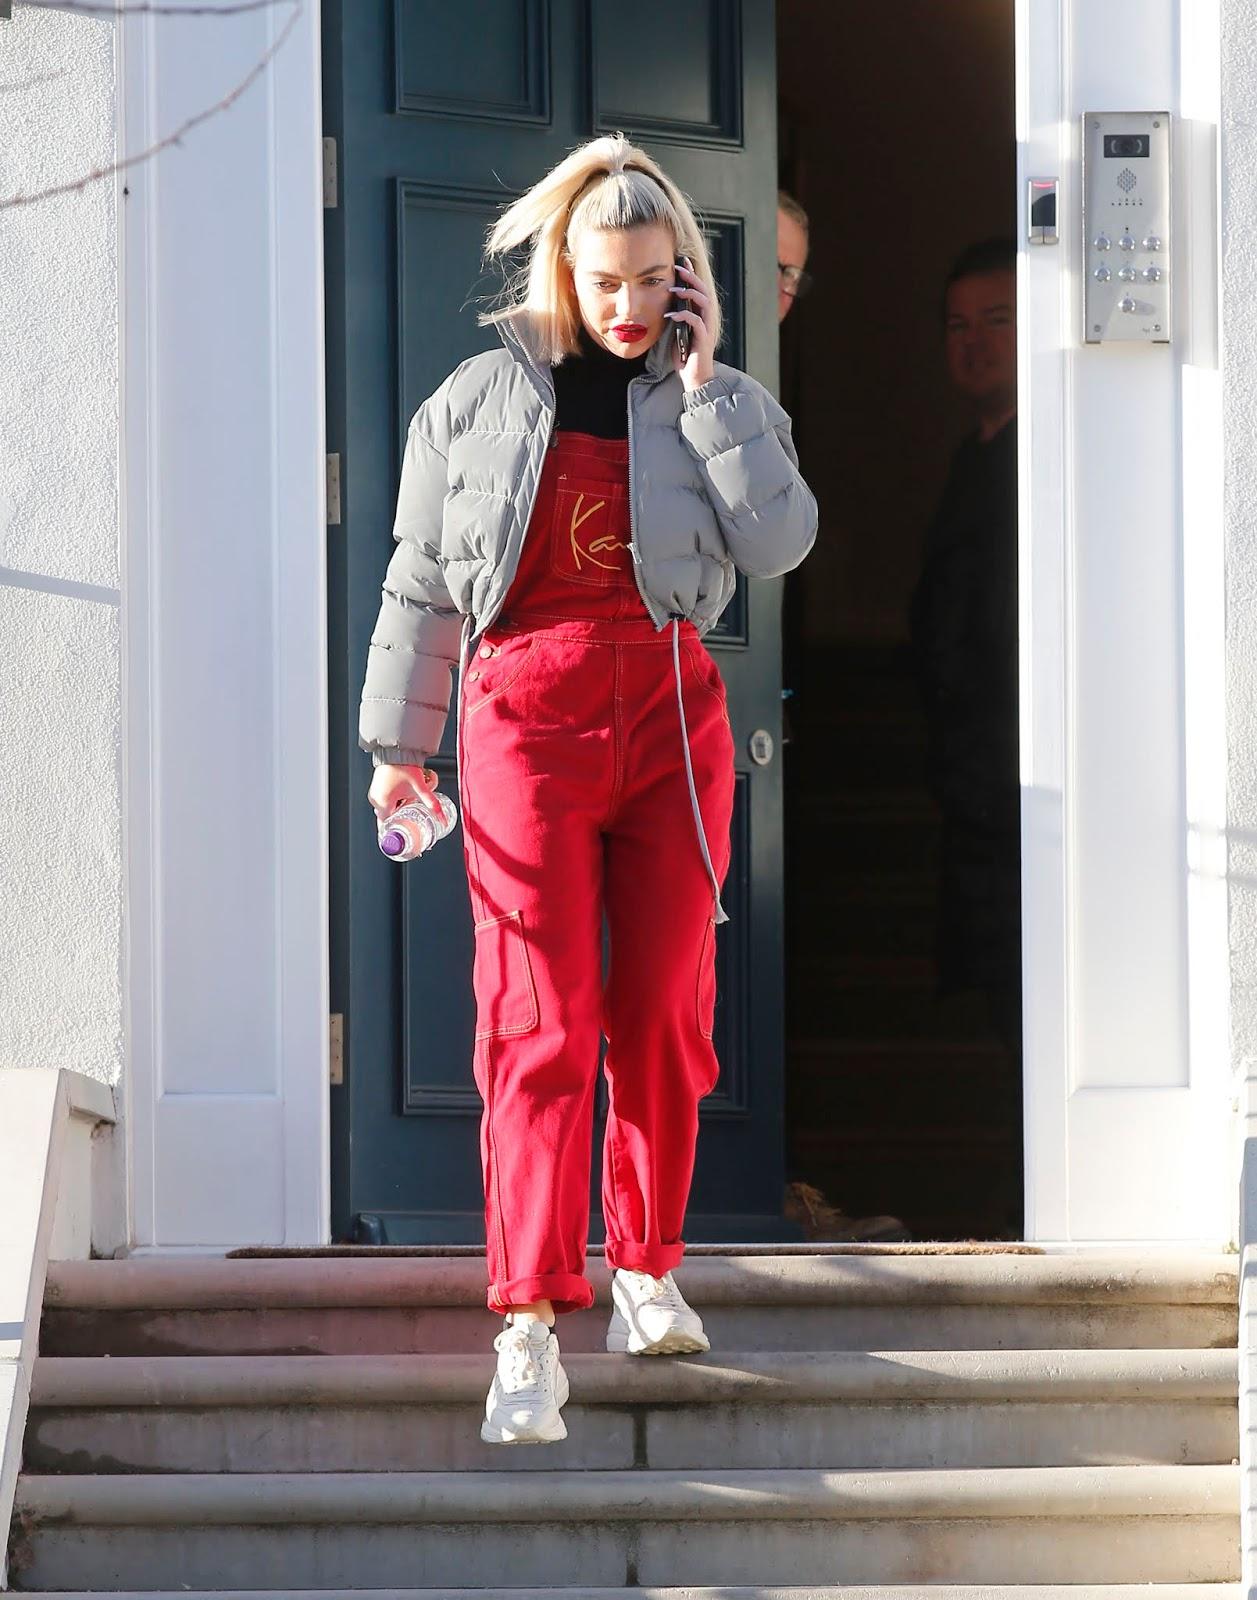 Megan Barton Hanson leaves her North London home - 01/28/2019